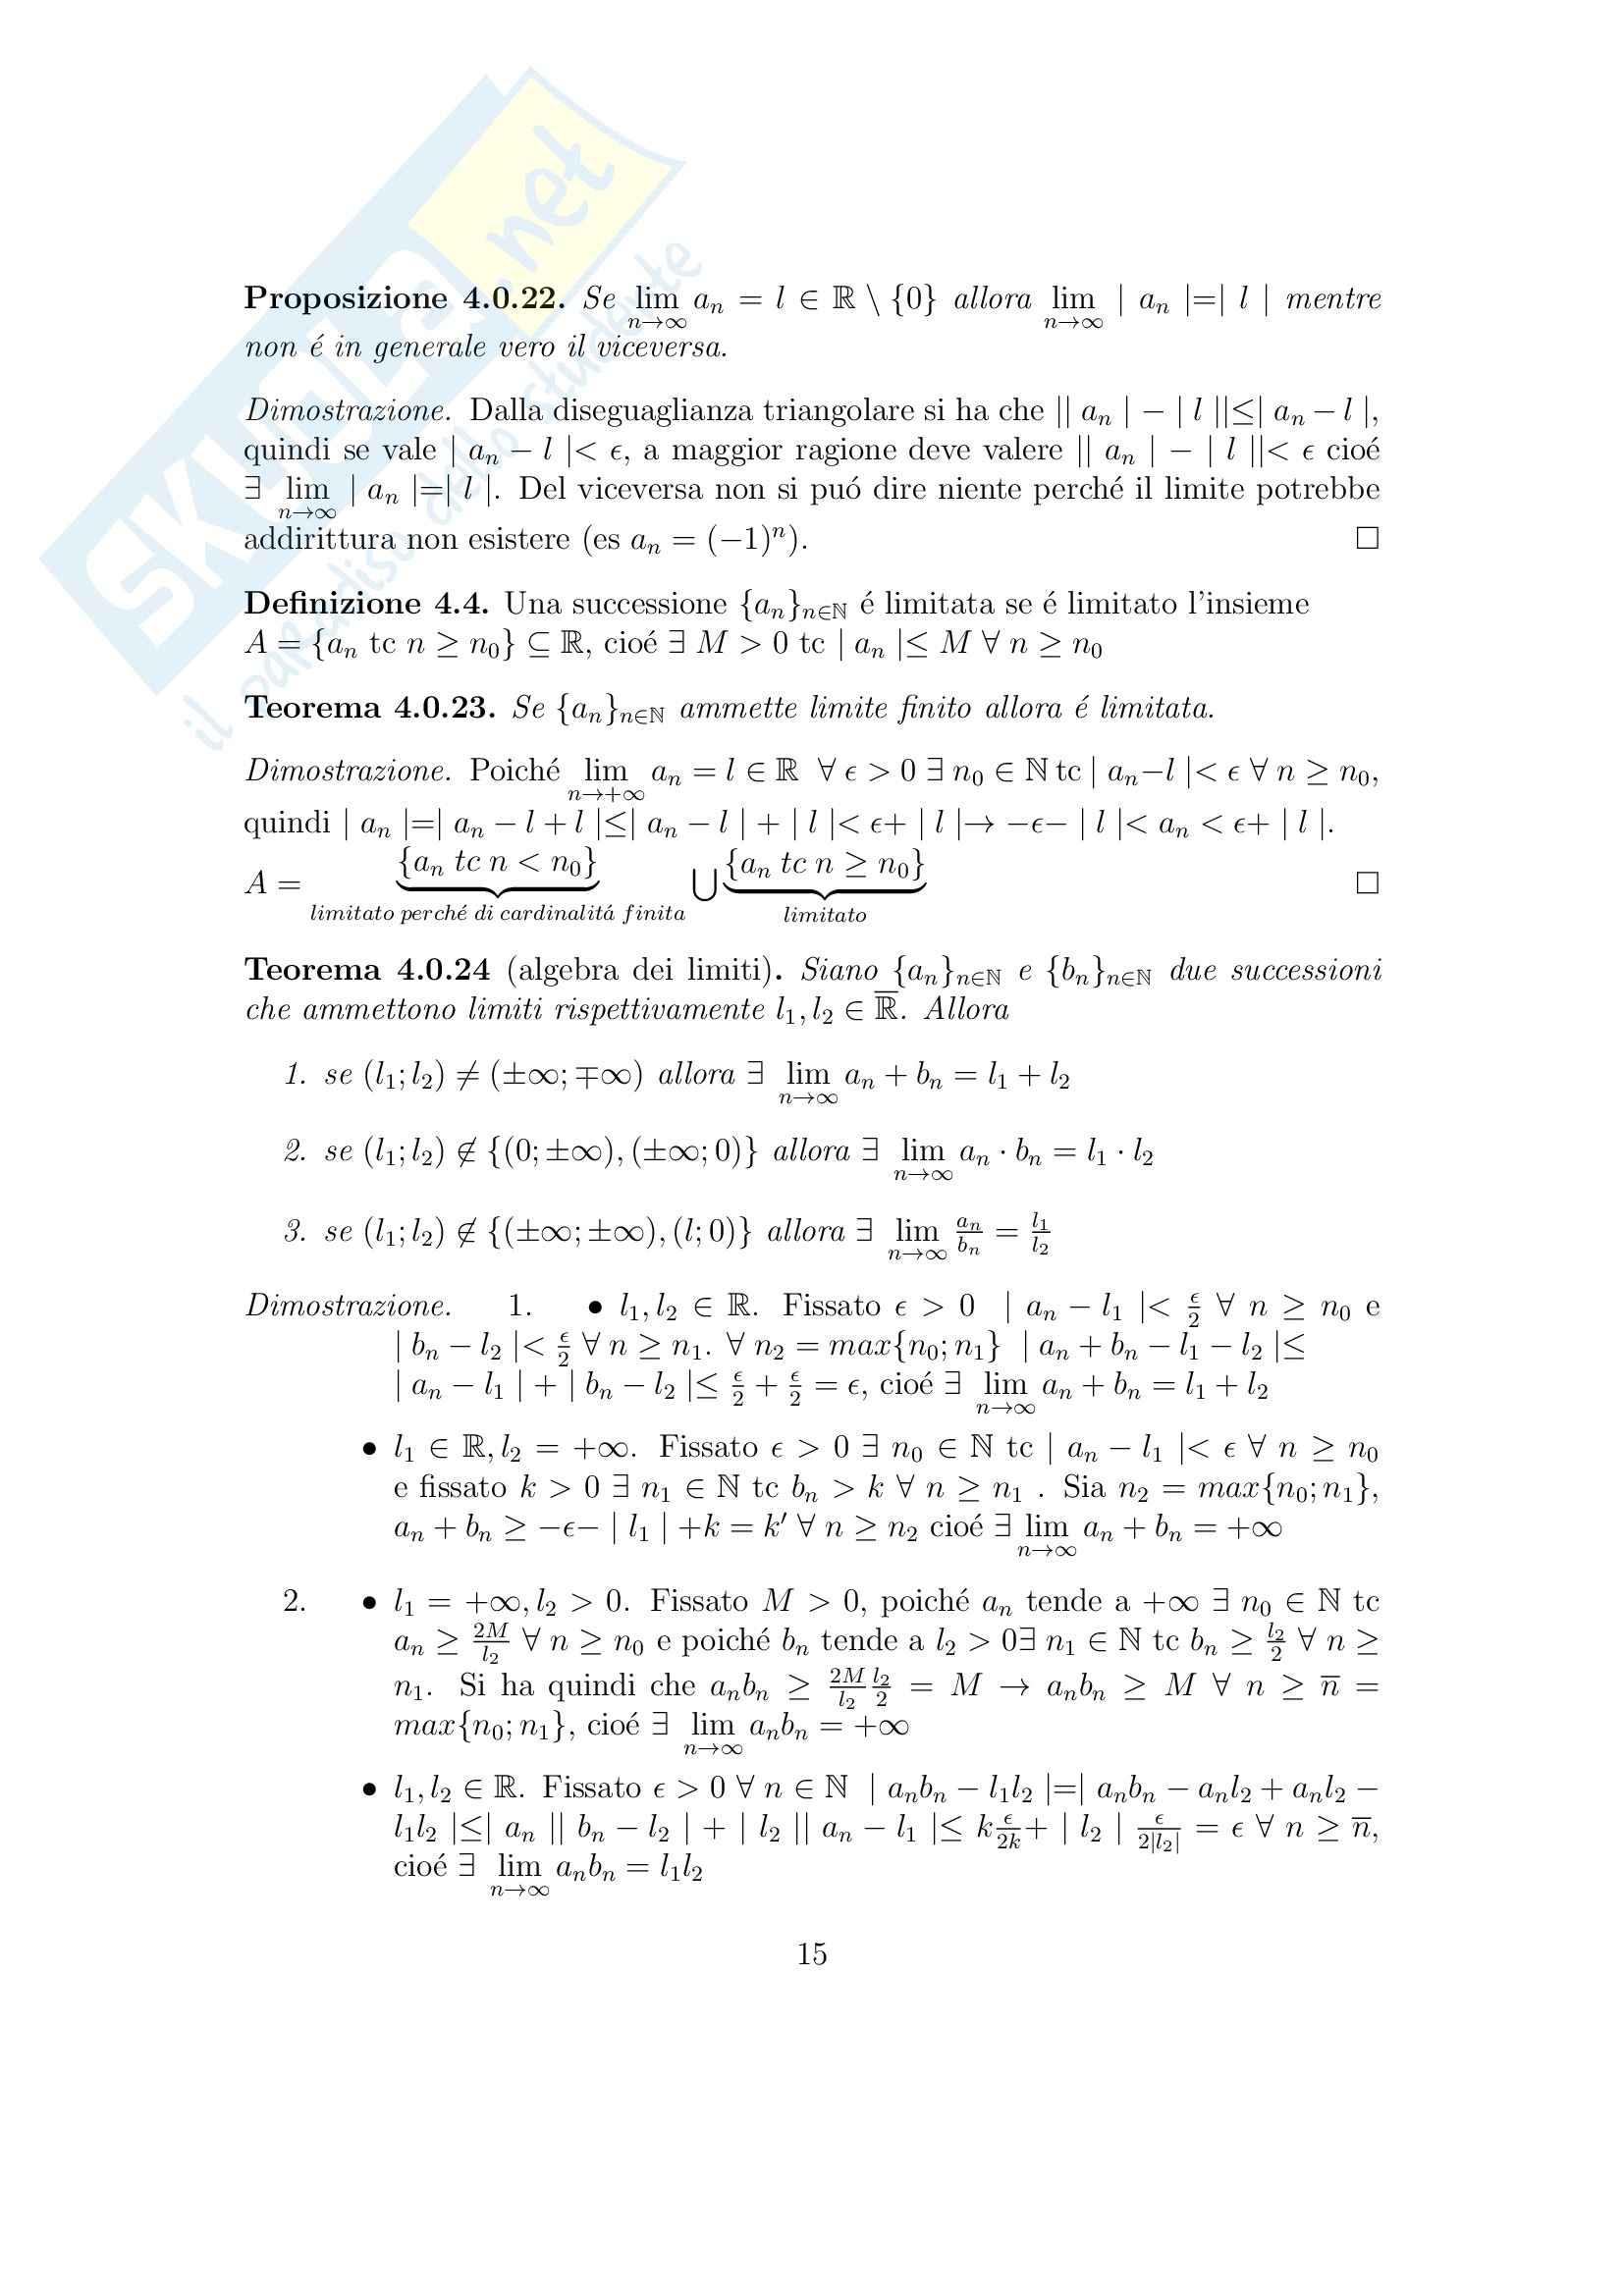 Analisi matematica 1 - Appunti Pag. 16